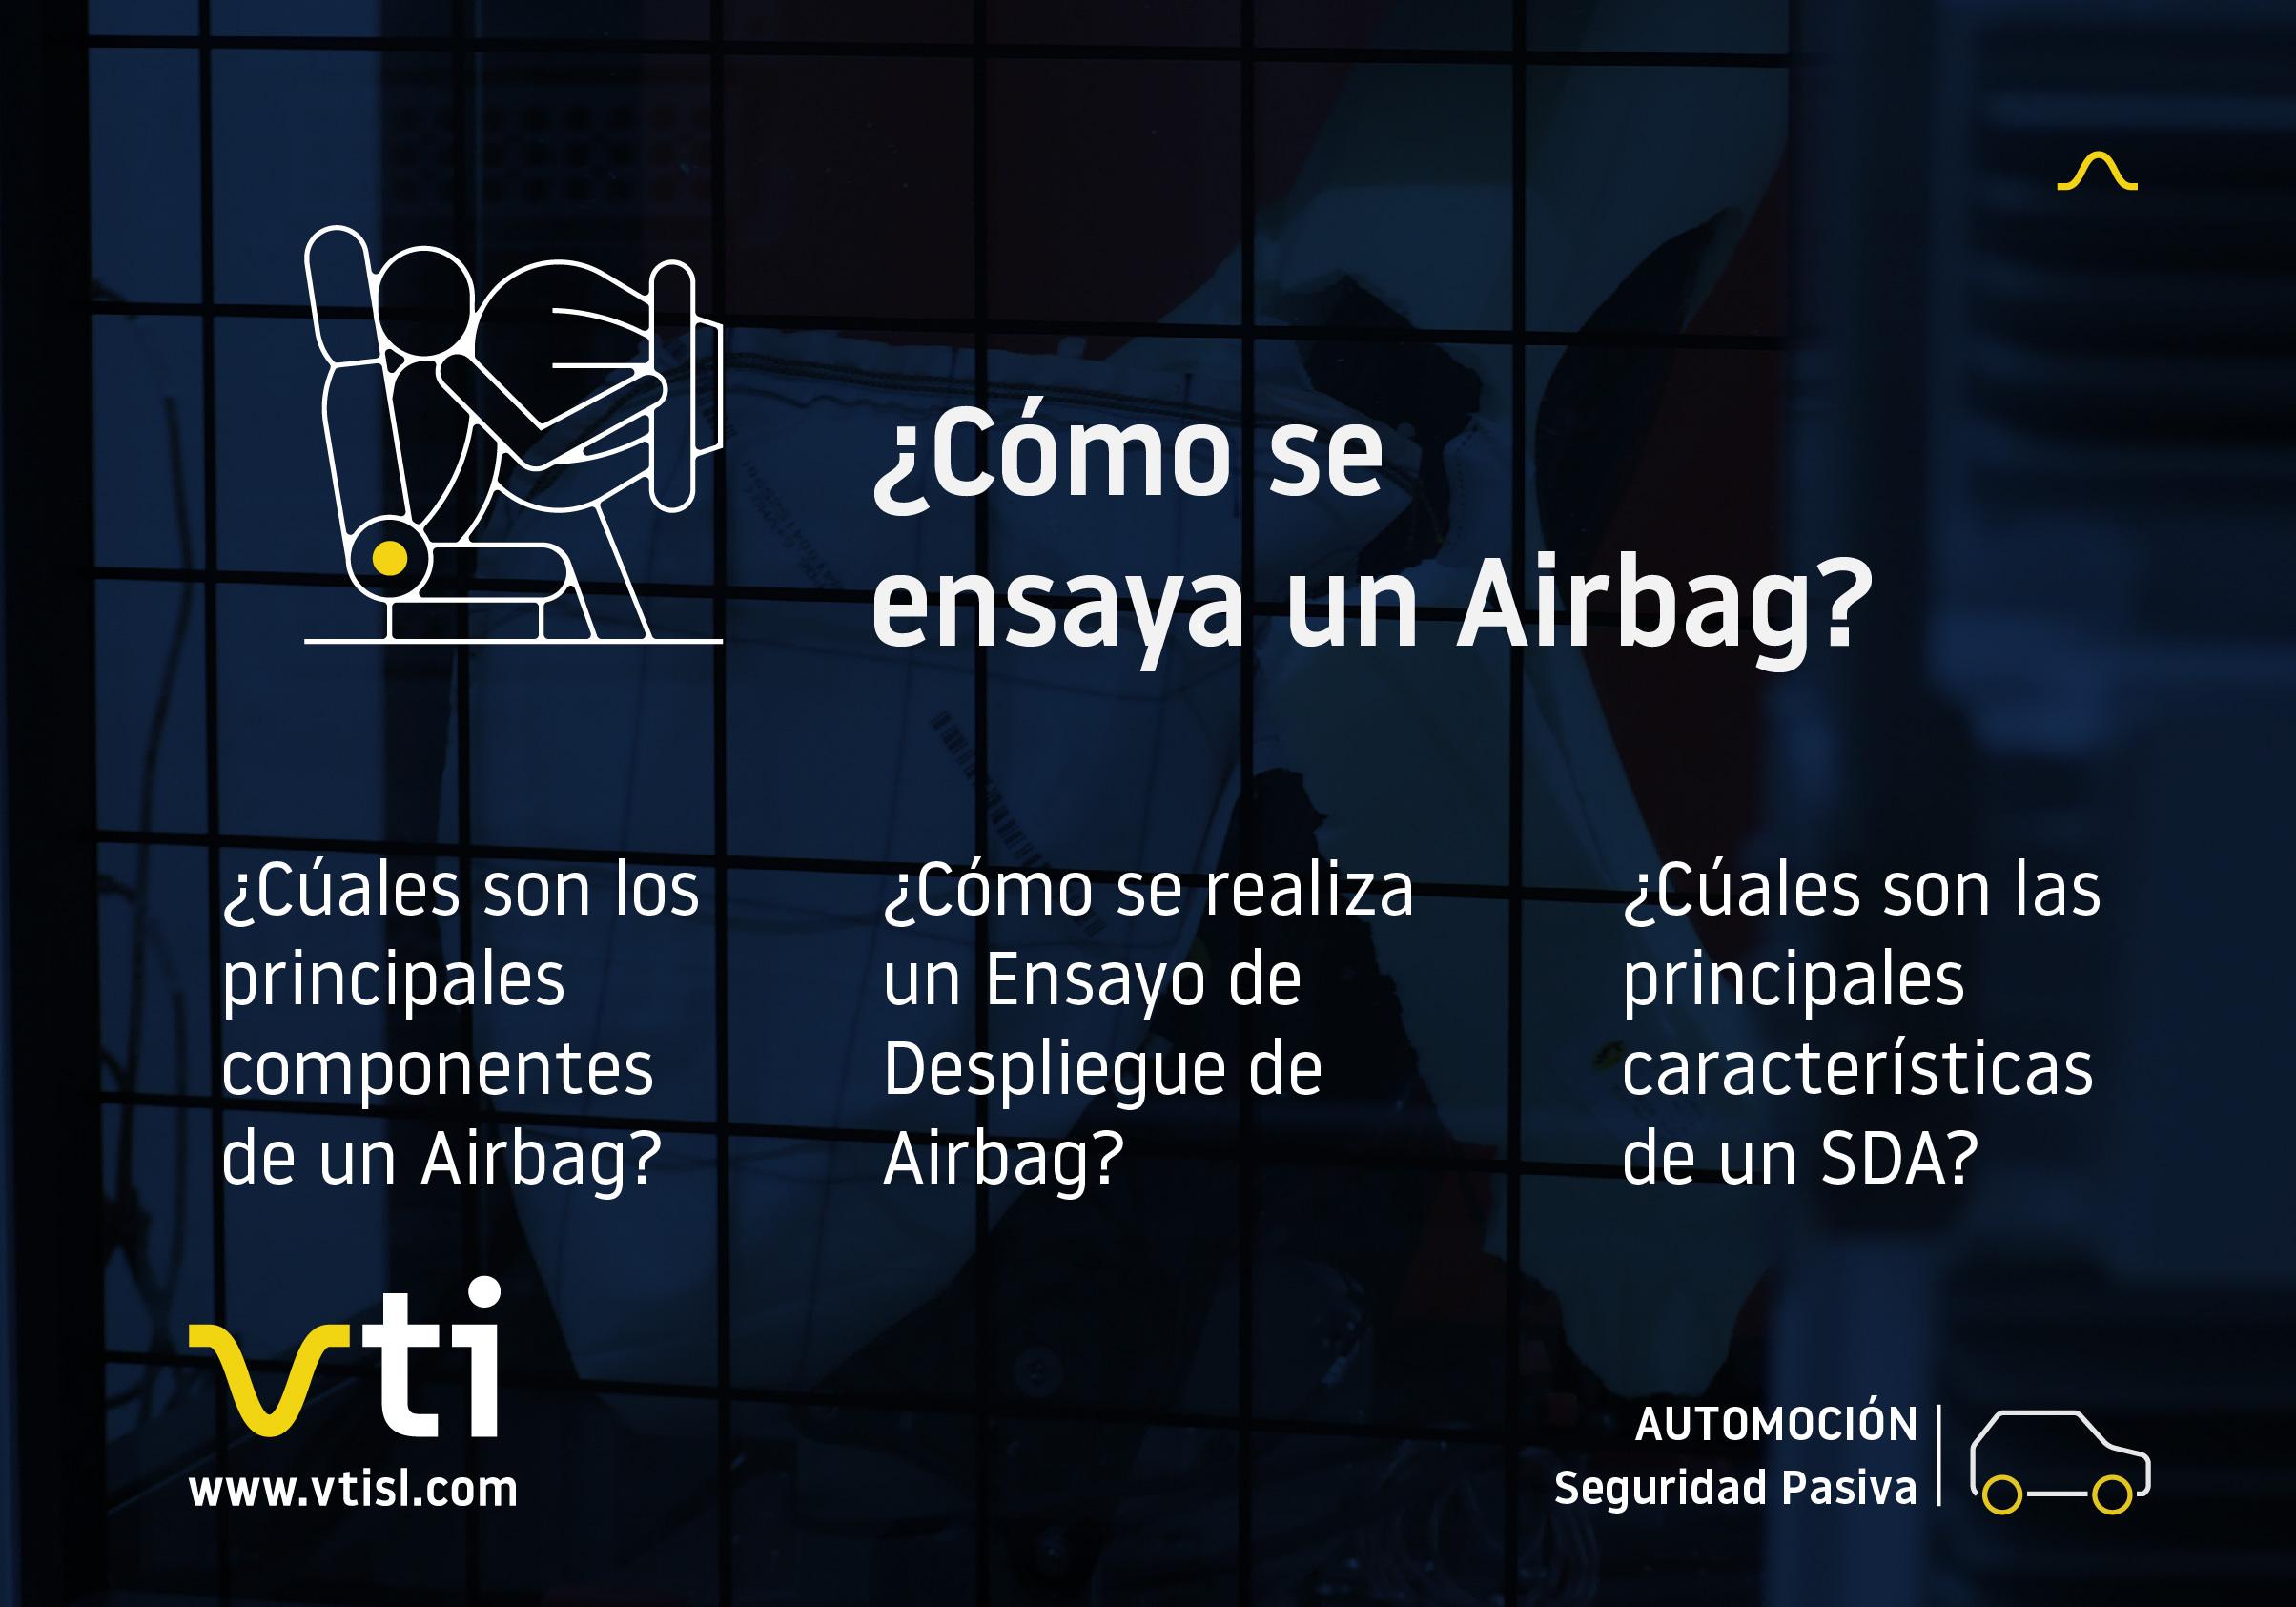 vtinot_como_ensaya_airbag-07.jpg